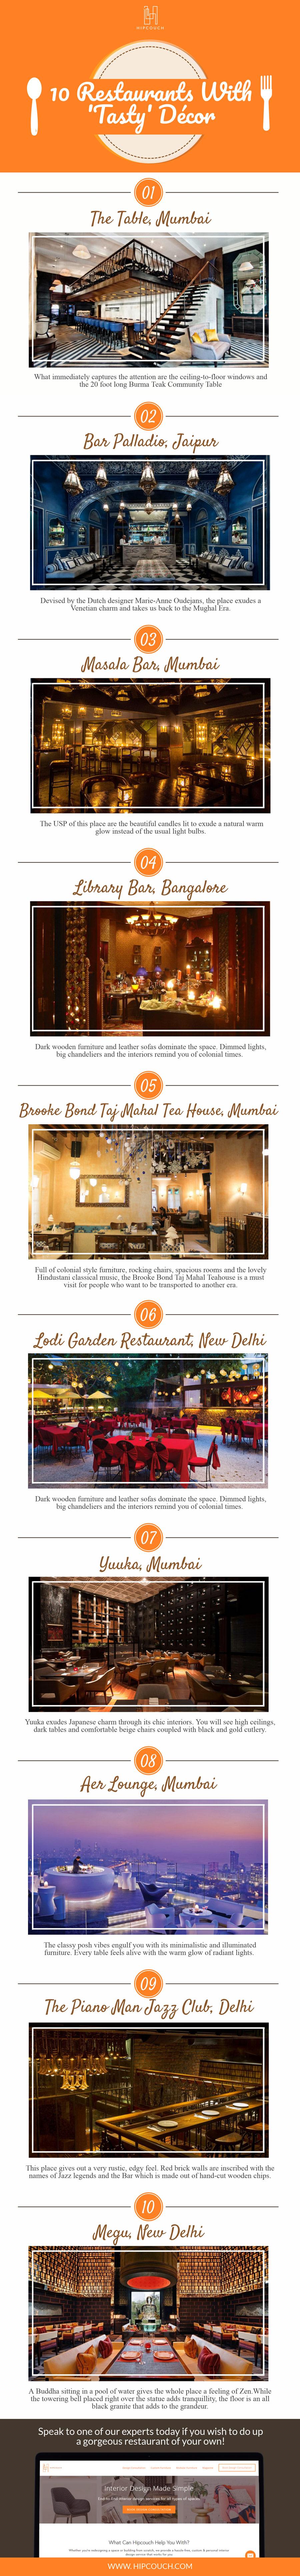 10 Restaurants With Tasty Interiors!